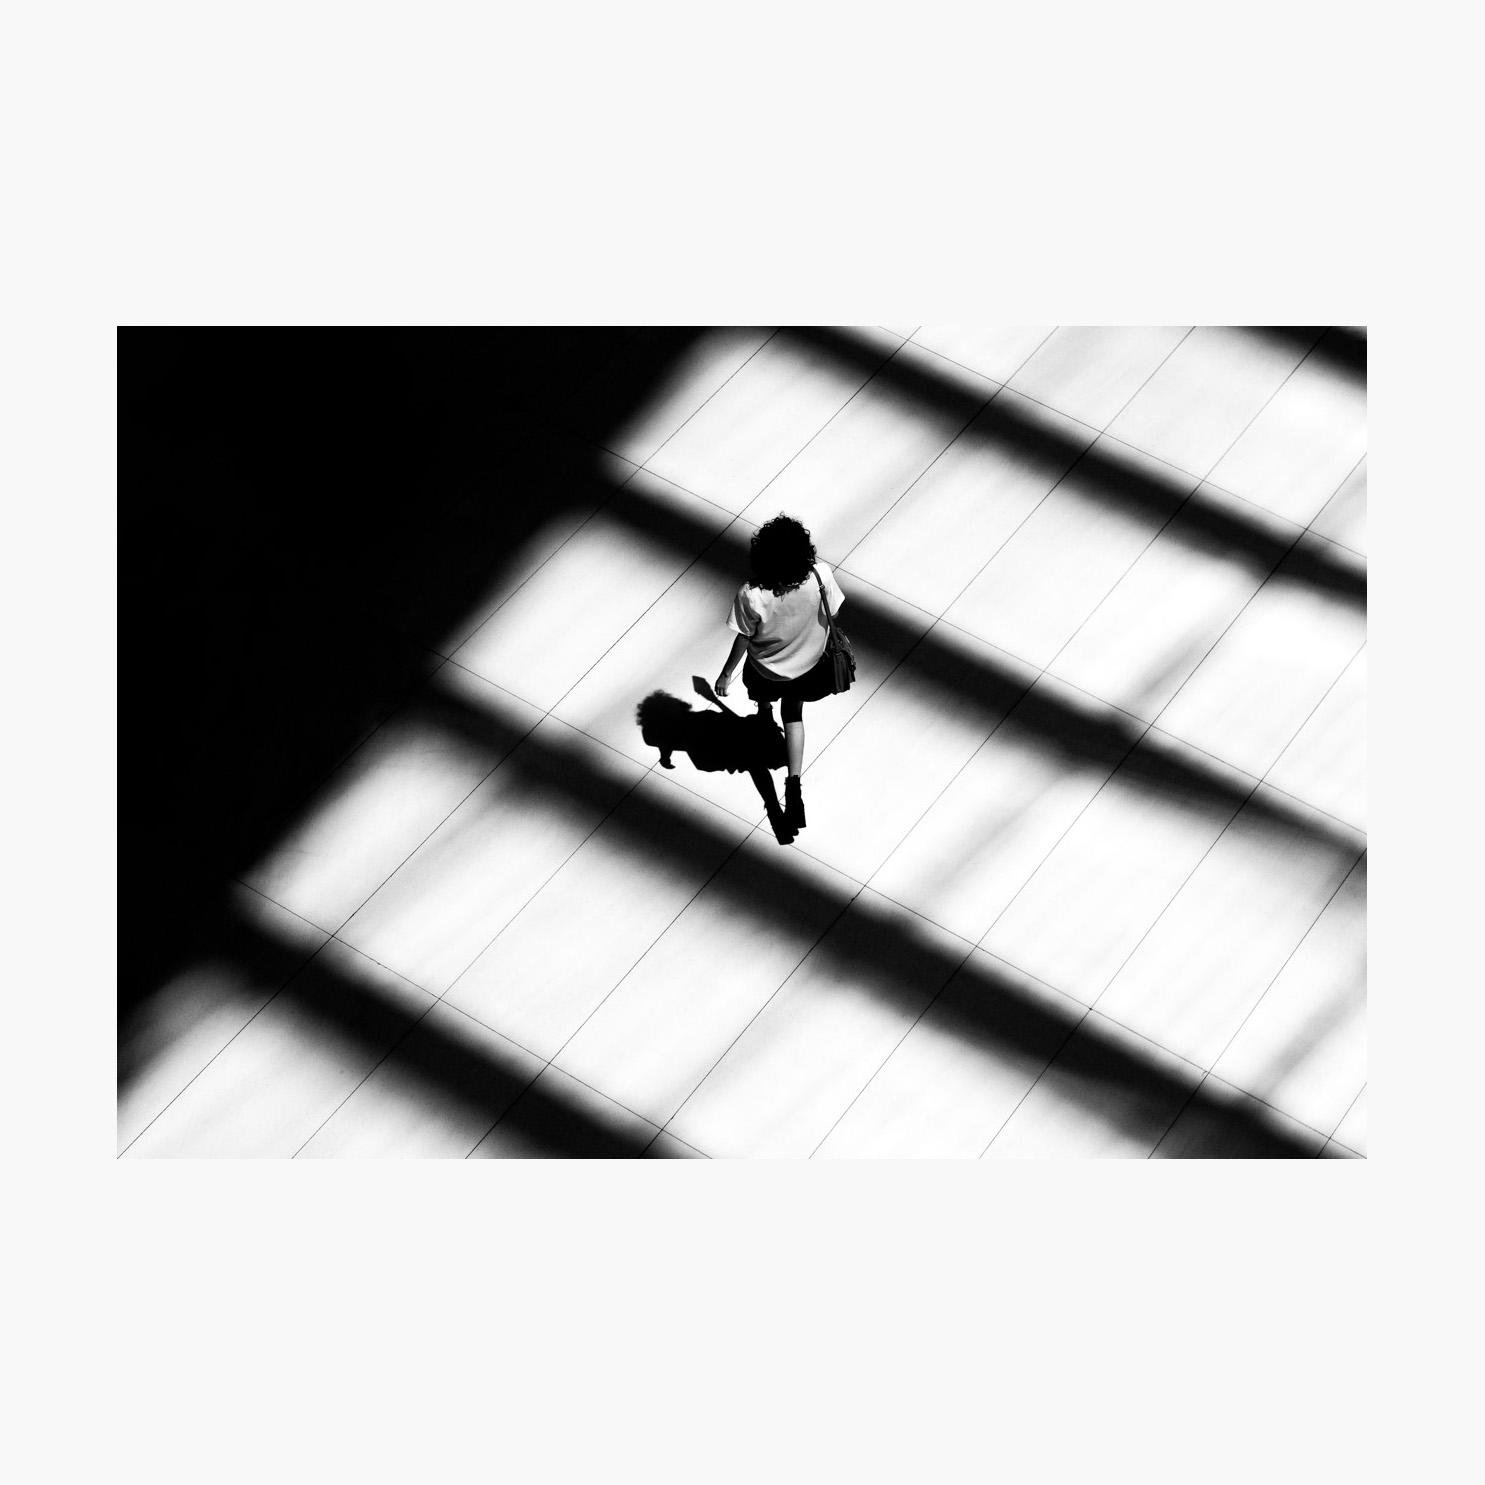 ©-2018-Harry-W-Edmonds-London-Photographer-Missing-the-Shot-PN05.jpg